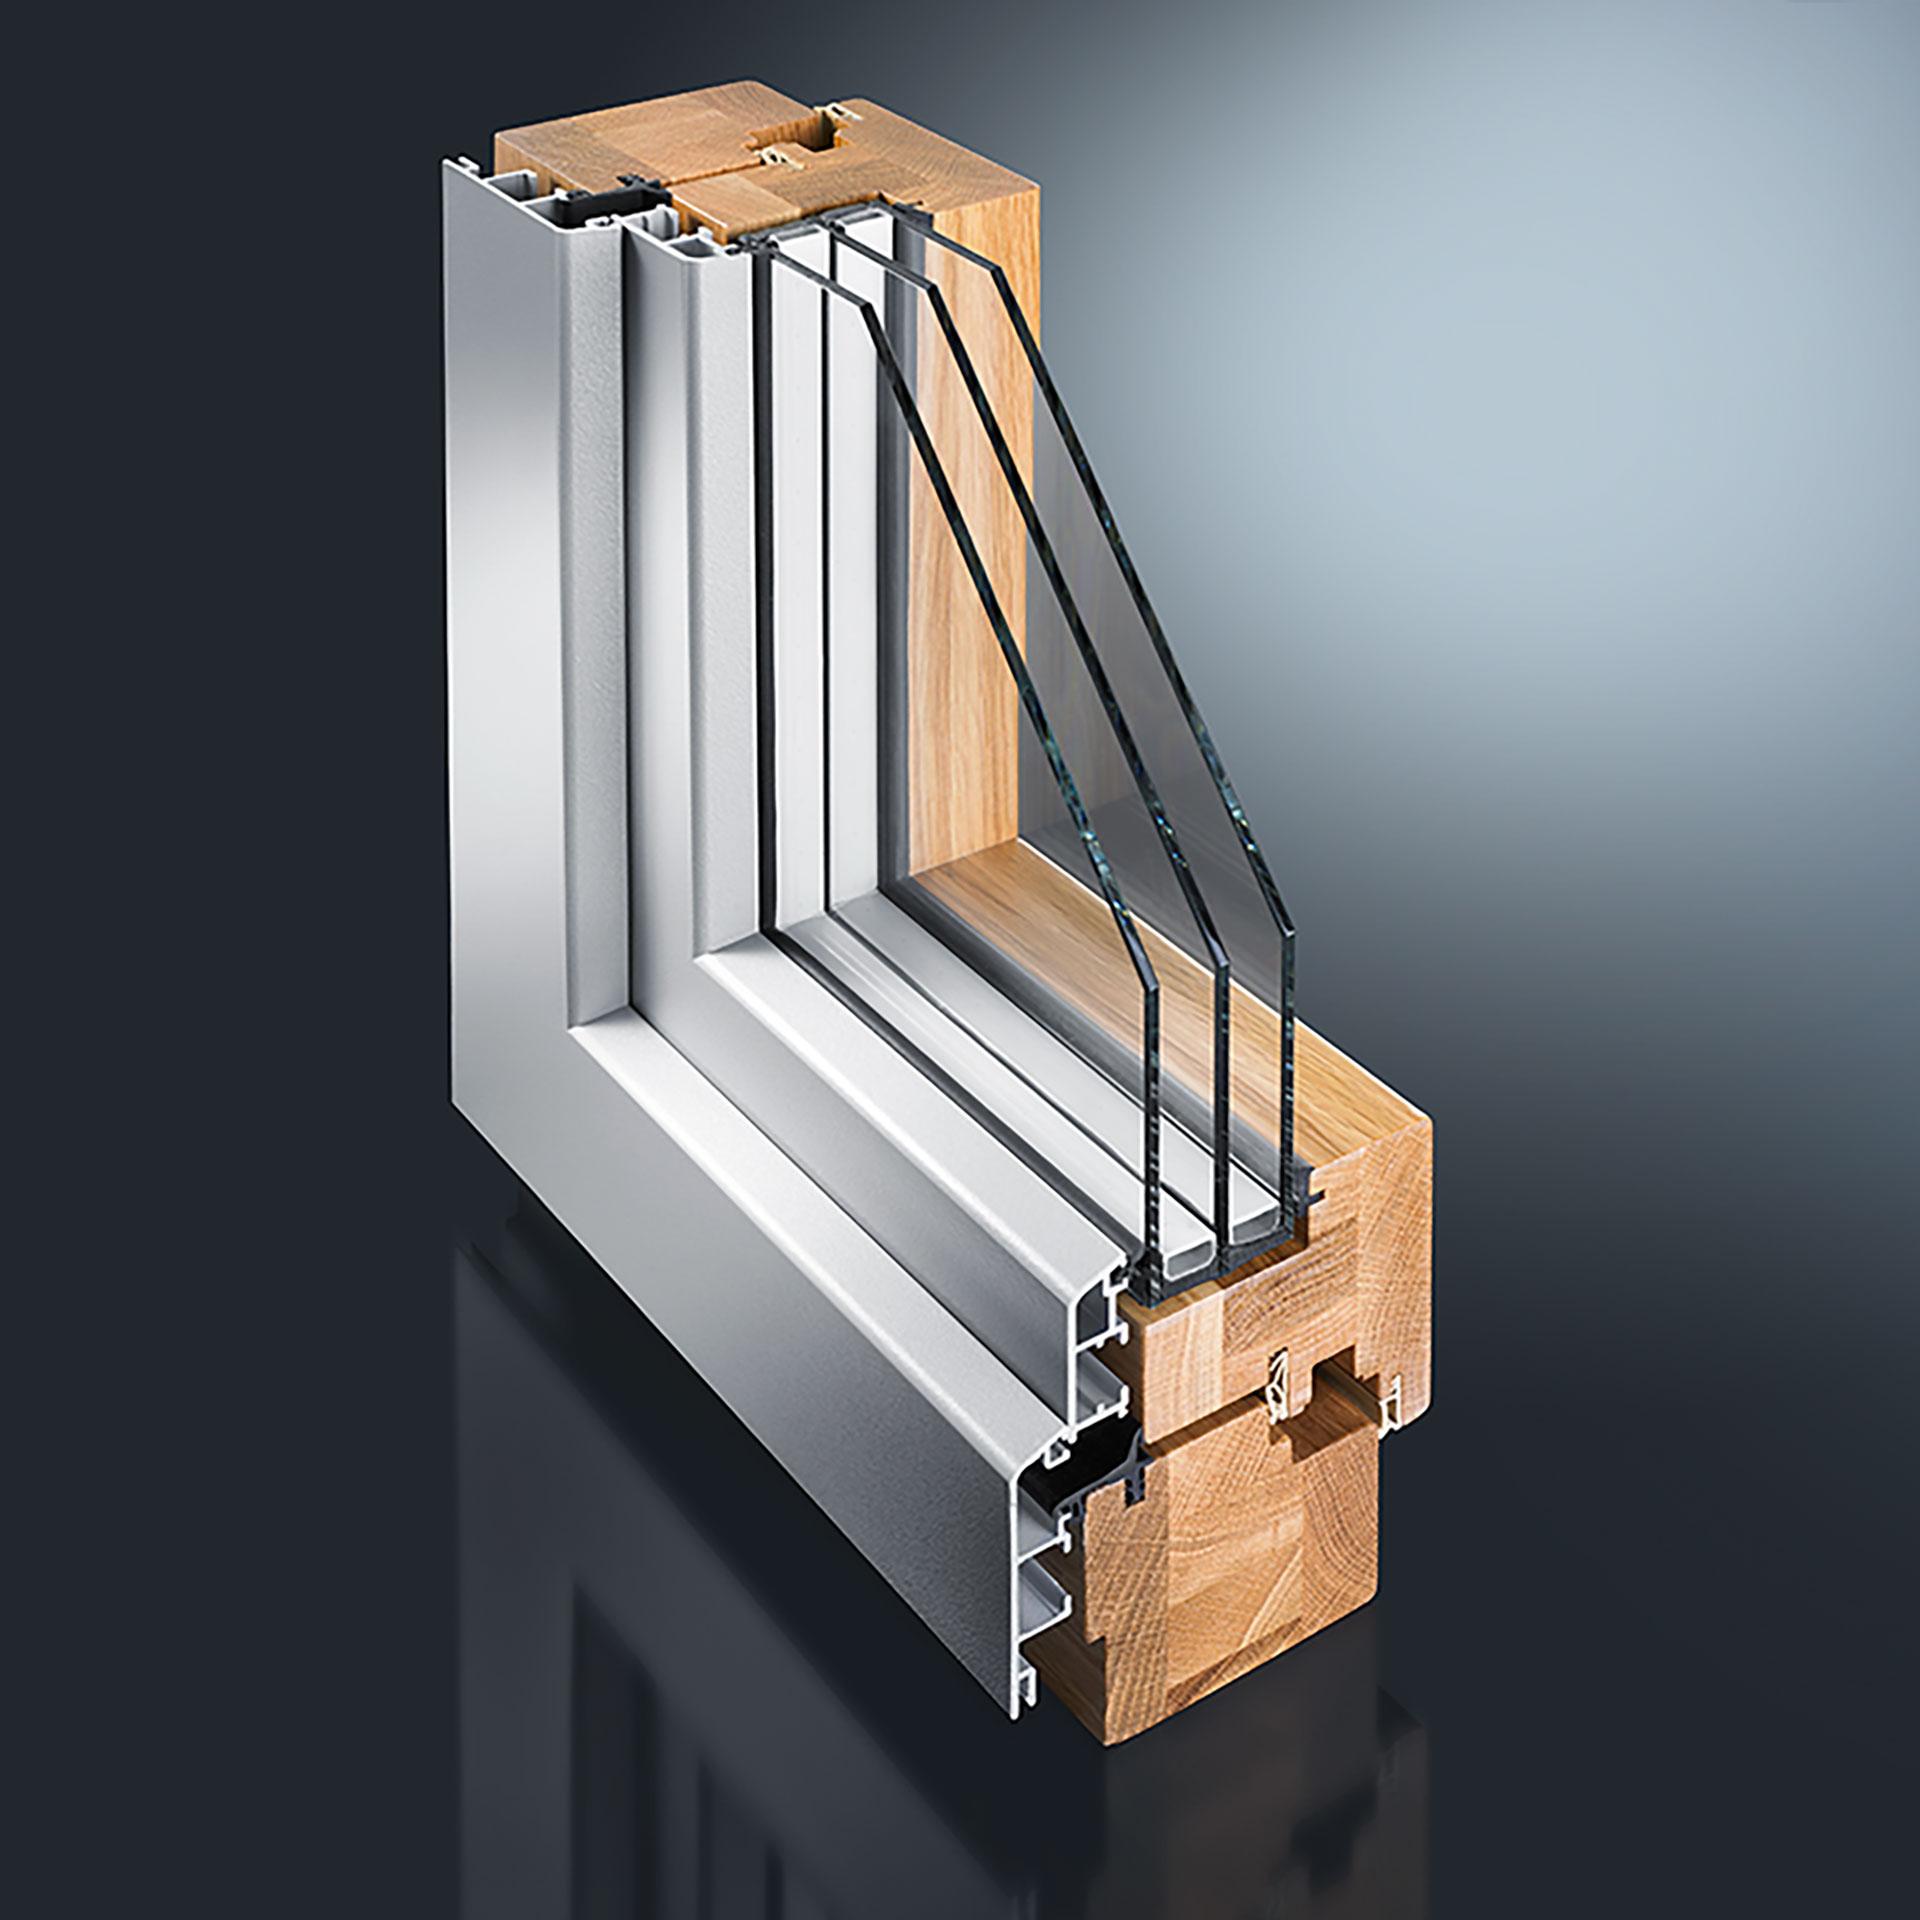 Full Size of Holz Aluminium Fenster Preis Alu Leistung Preise Online Unilux Holz Alu Erfahrungen Preisliste Pro M2 Josko Qm Gutmann Mira Tr System Erneuern Kosten Fenster Holz Alu Fenster Preise